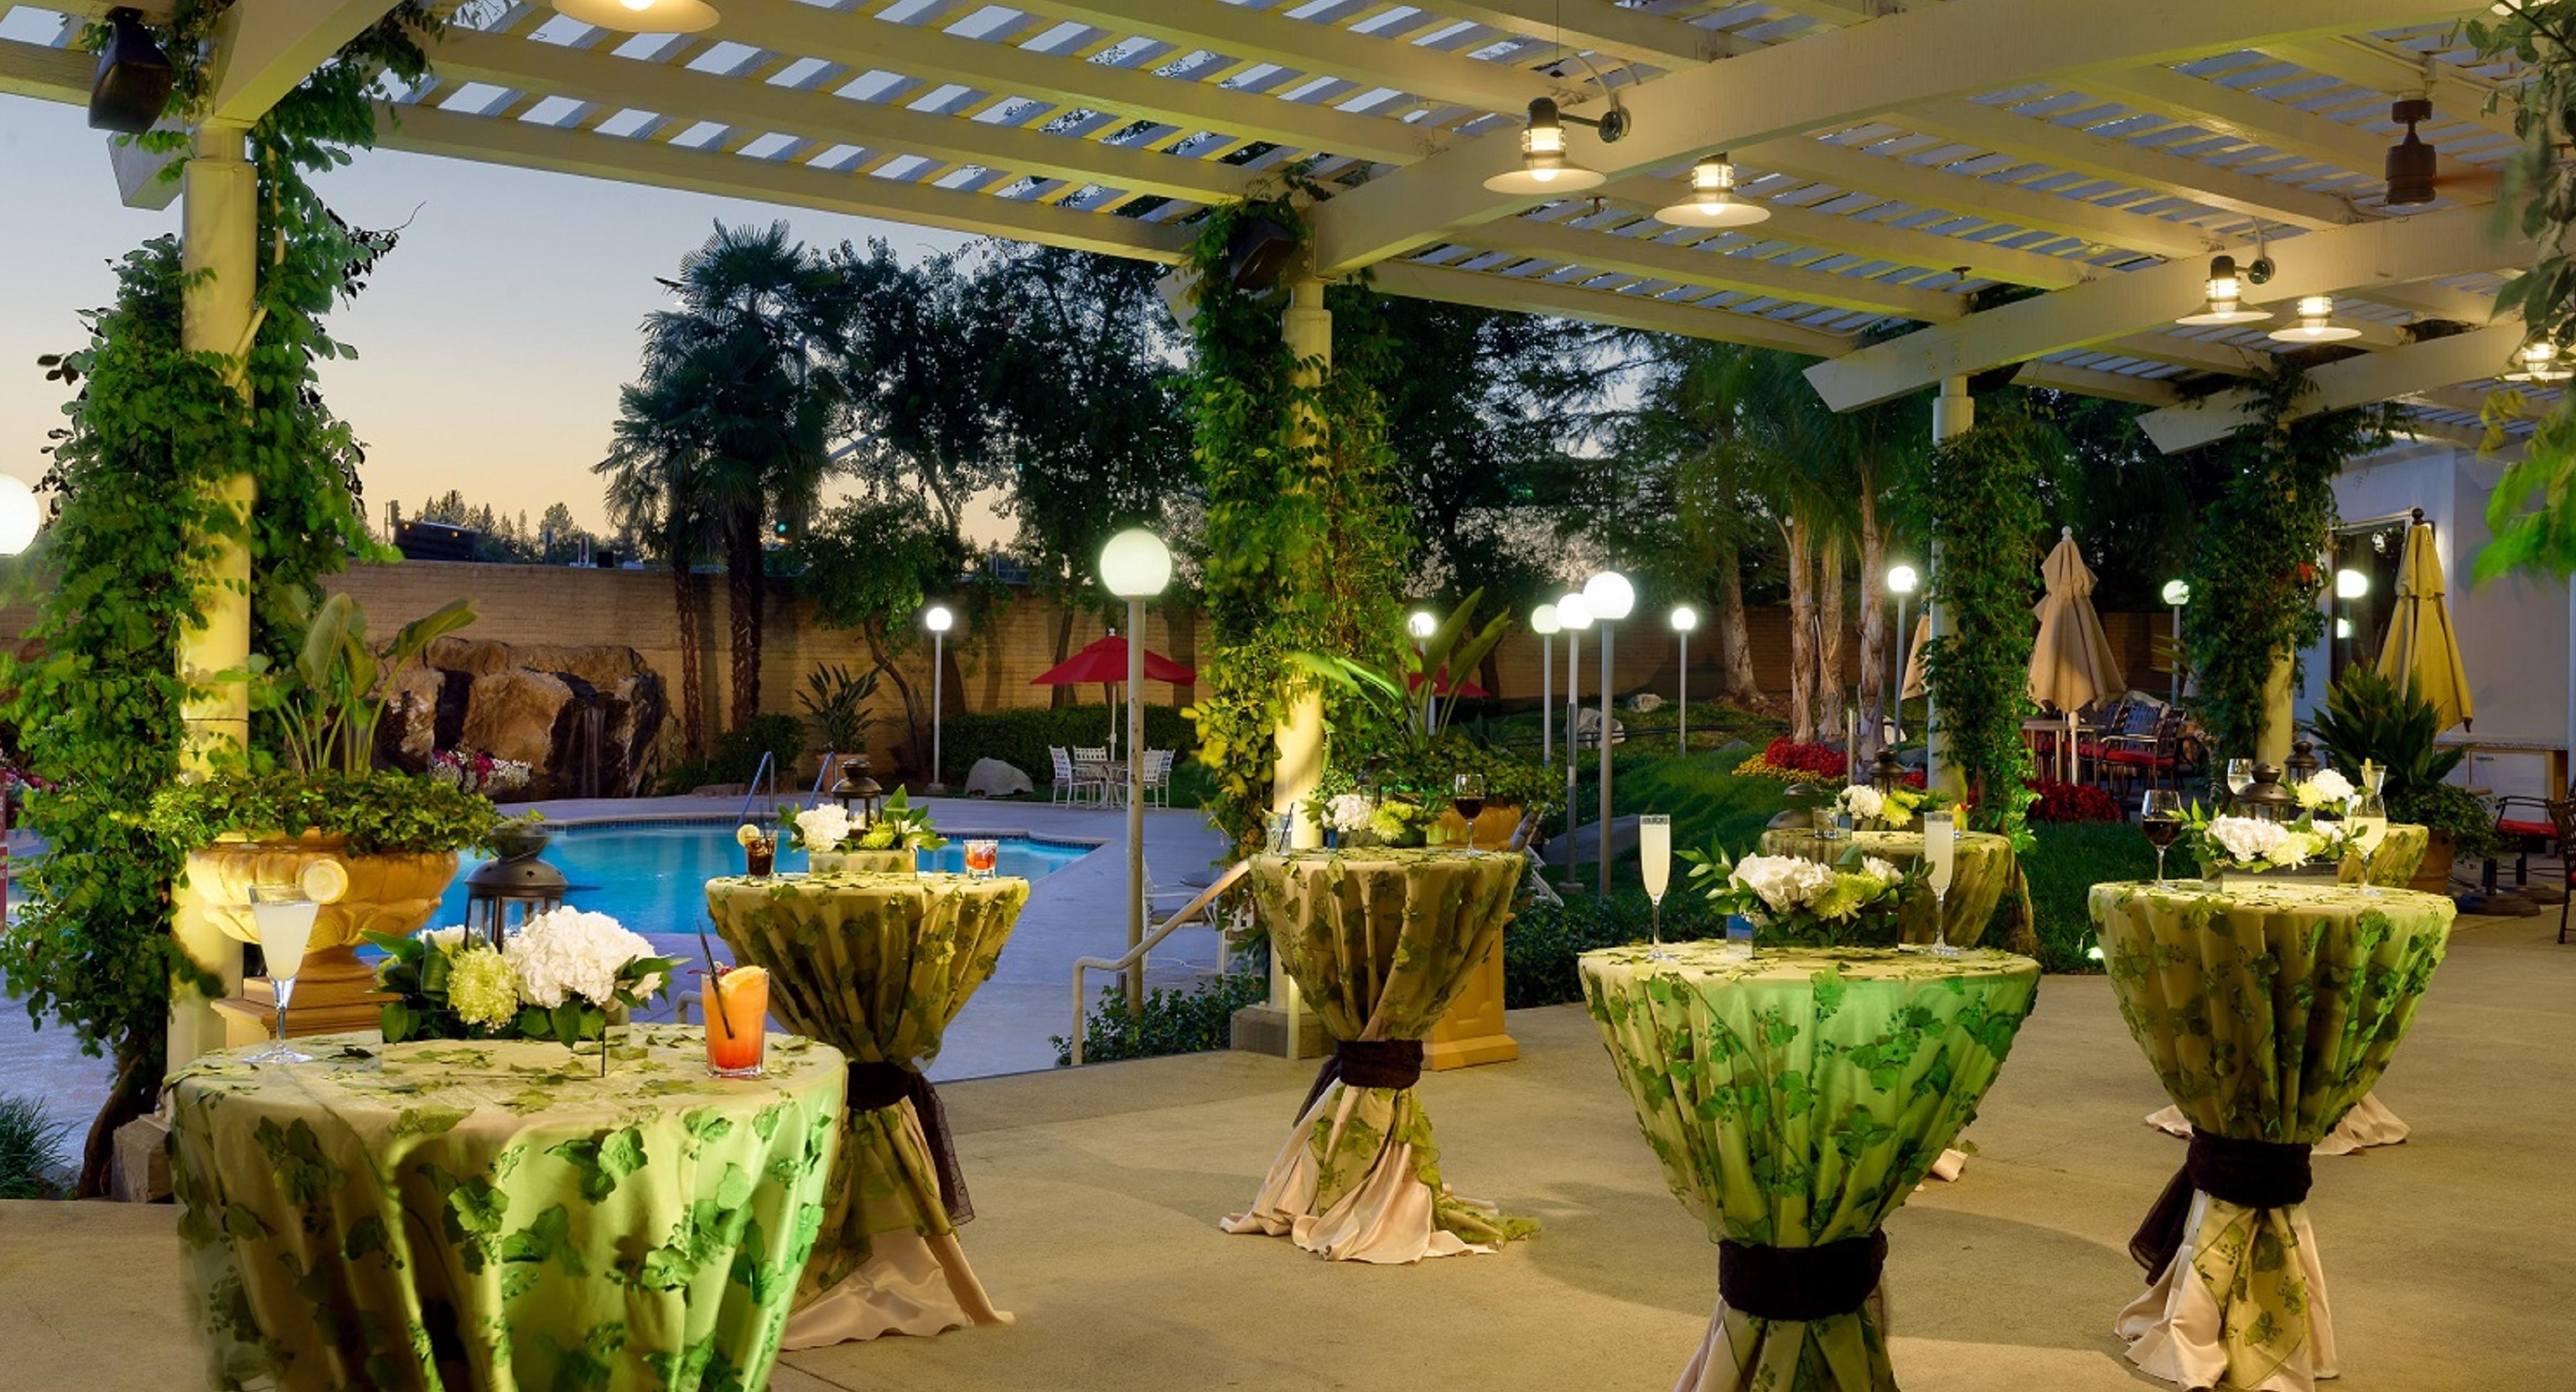 Sacramento Marriott Rancho Cordova HotelSacramento Marriott Rancho Cordova